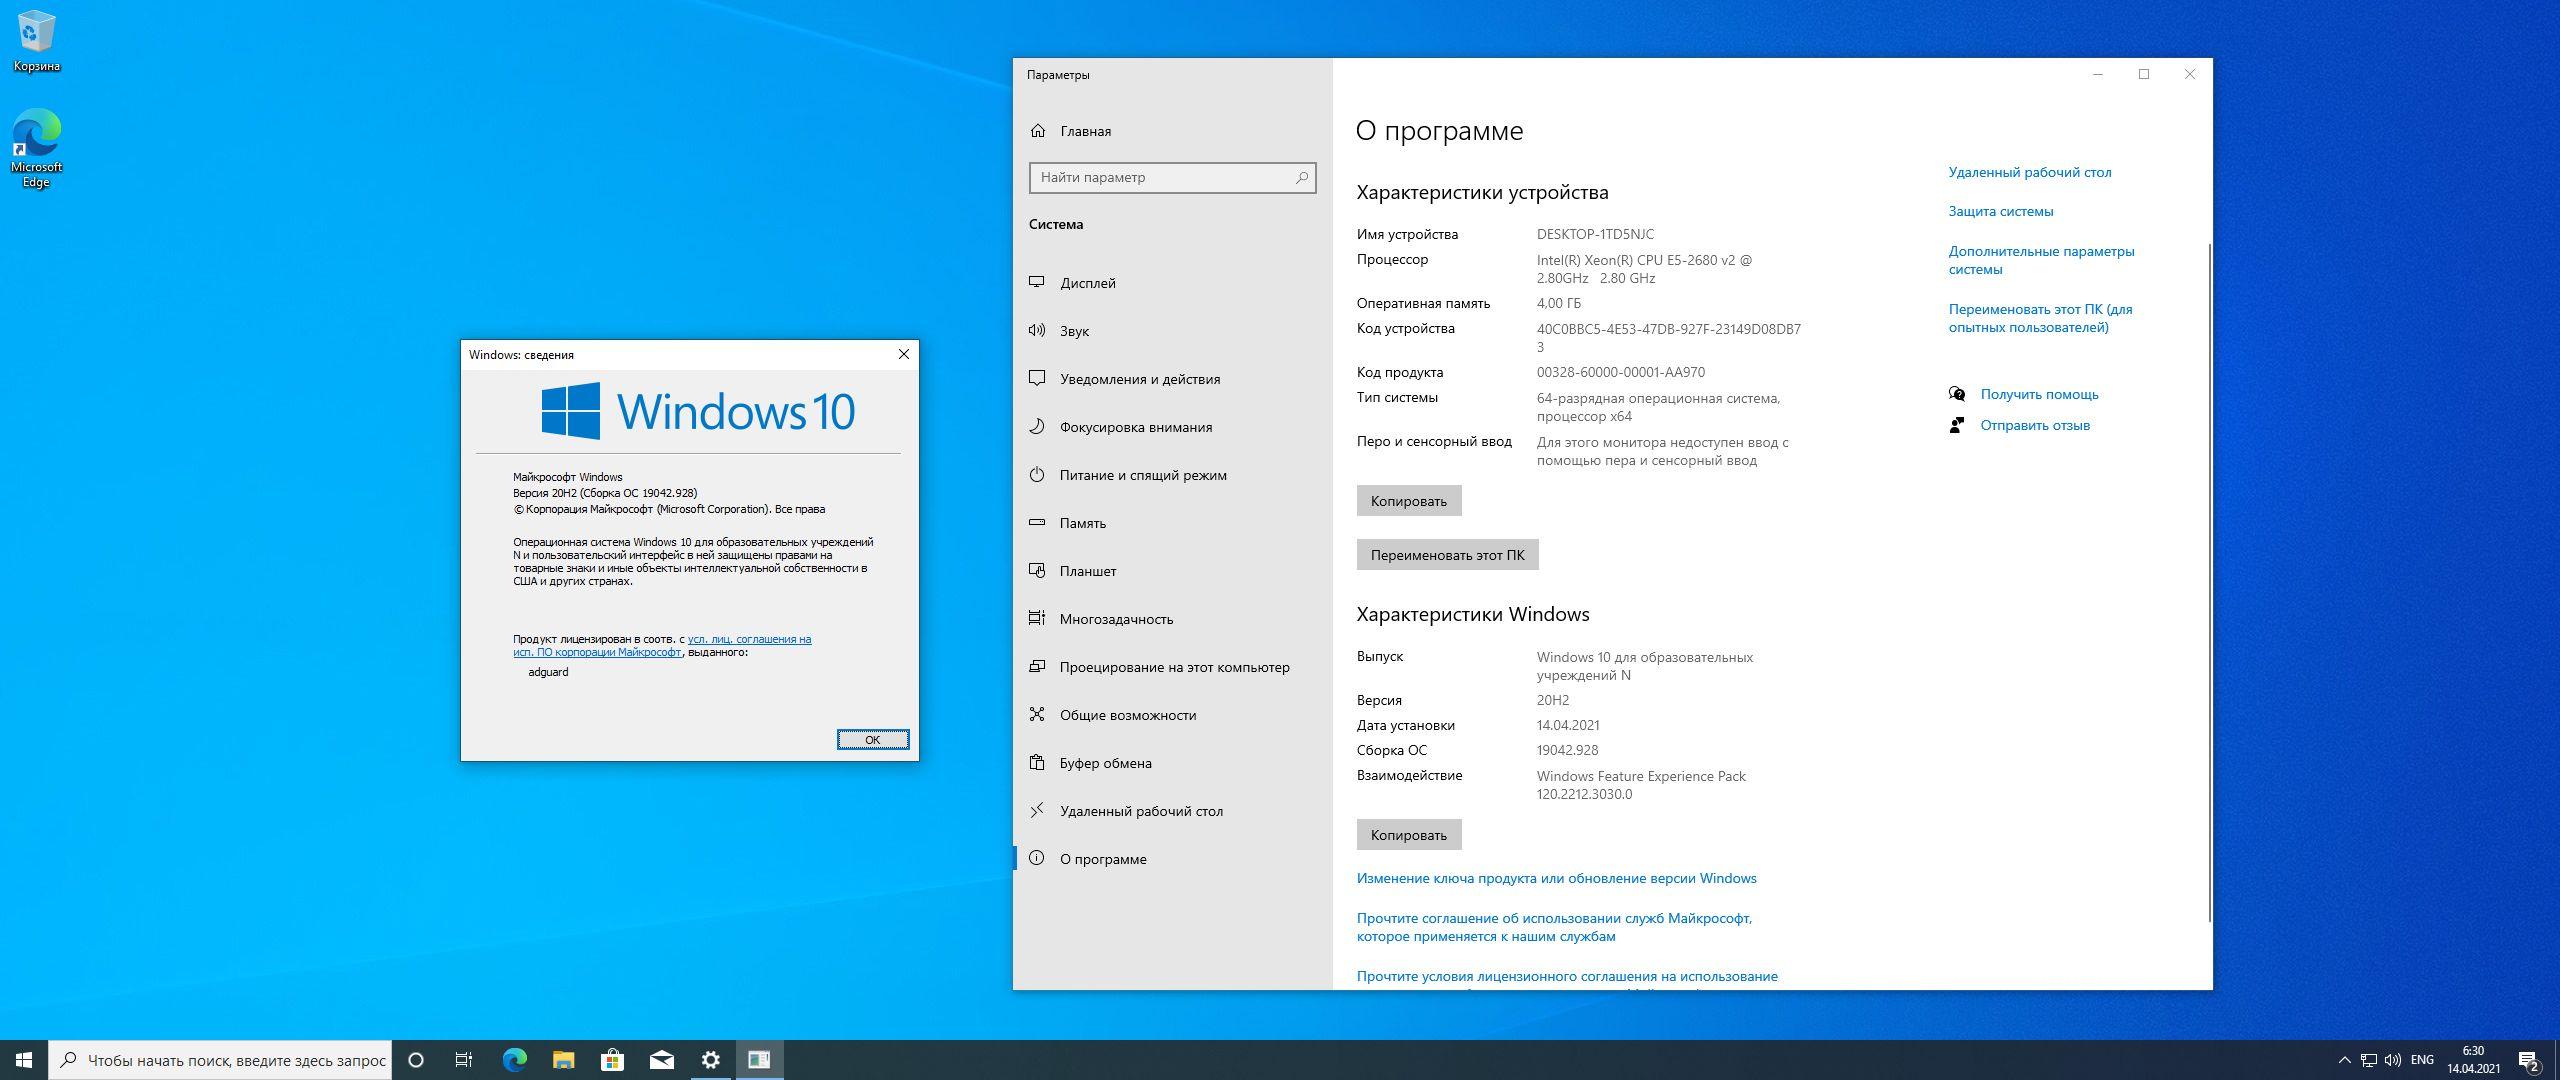 Универсальная сборка Windows 10 20H2 with Update [19042.928] AIO 64in2 (x86-x64) by adguard (v21.04.14)